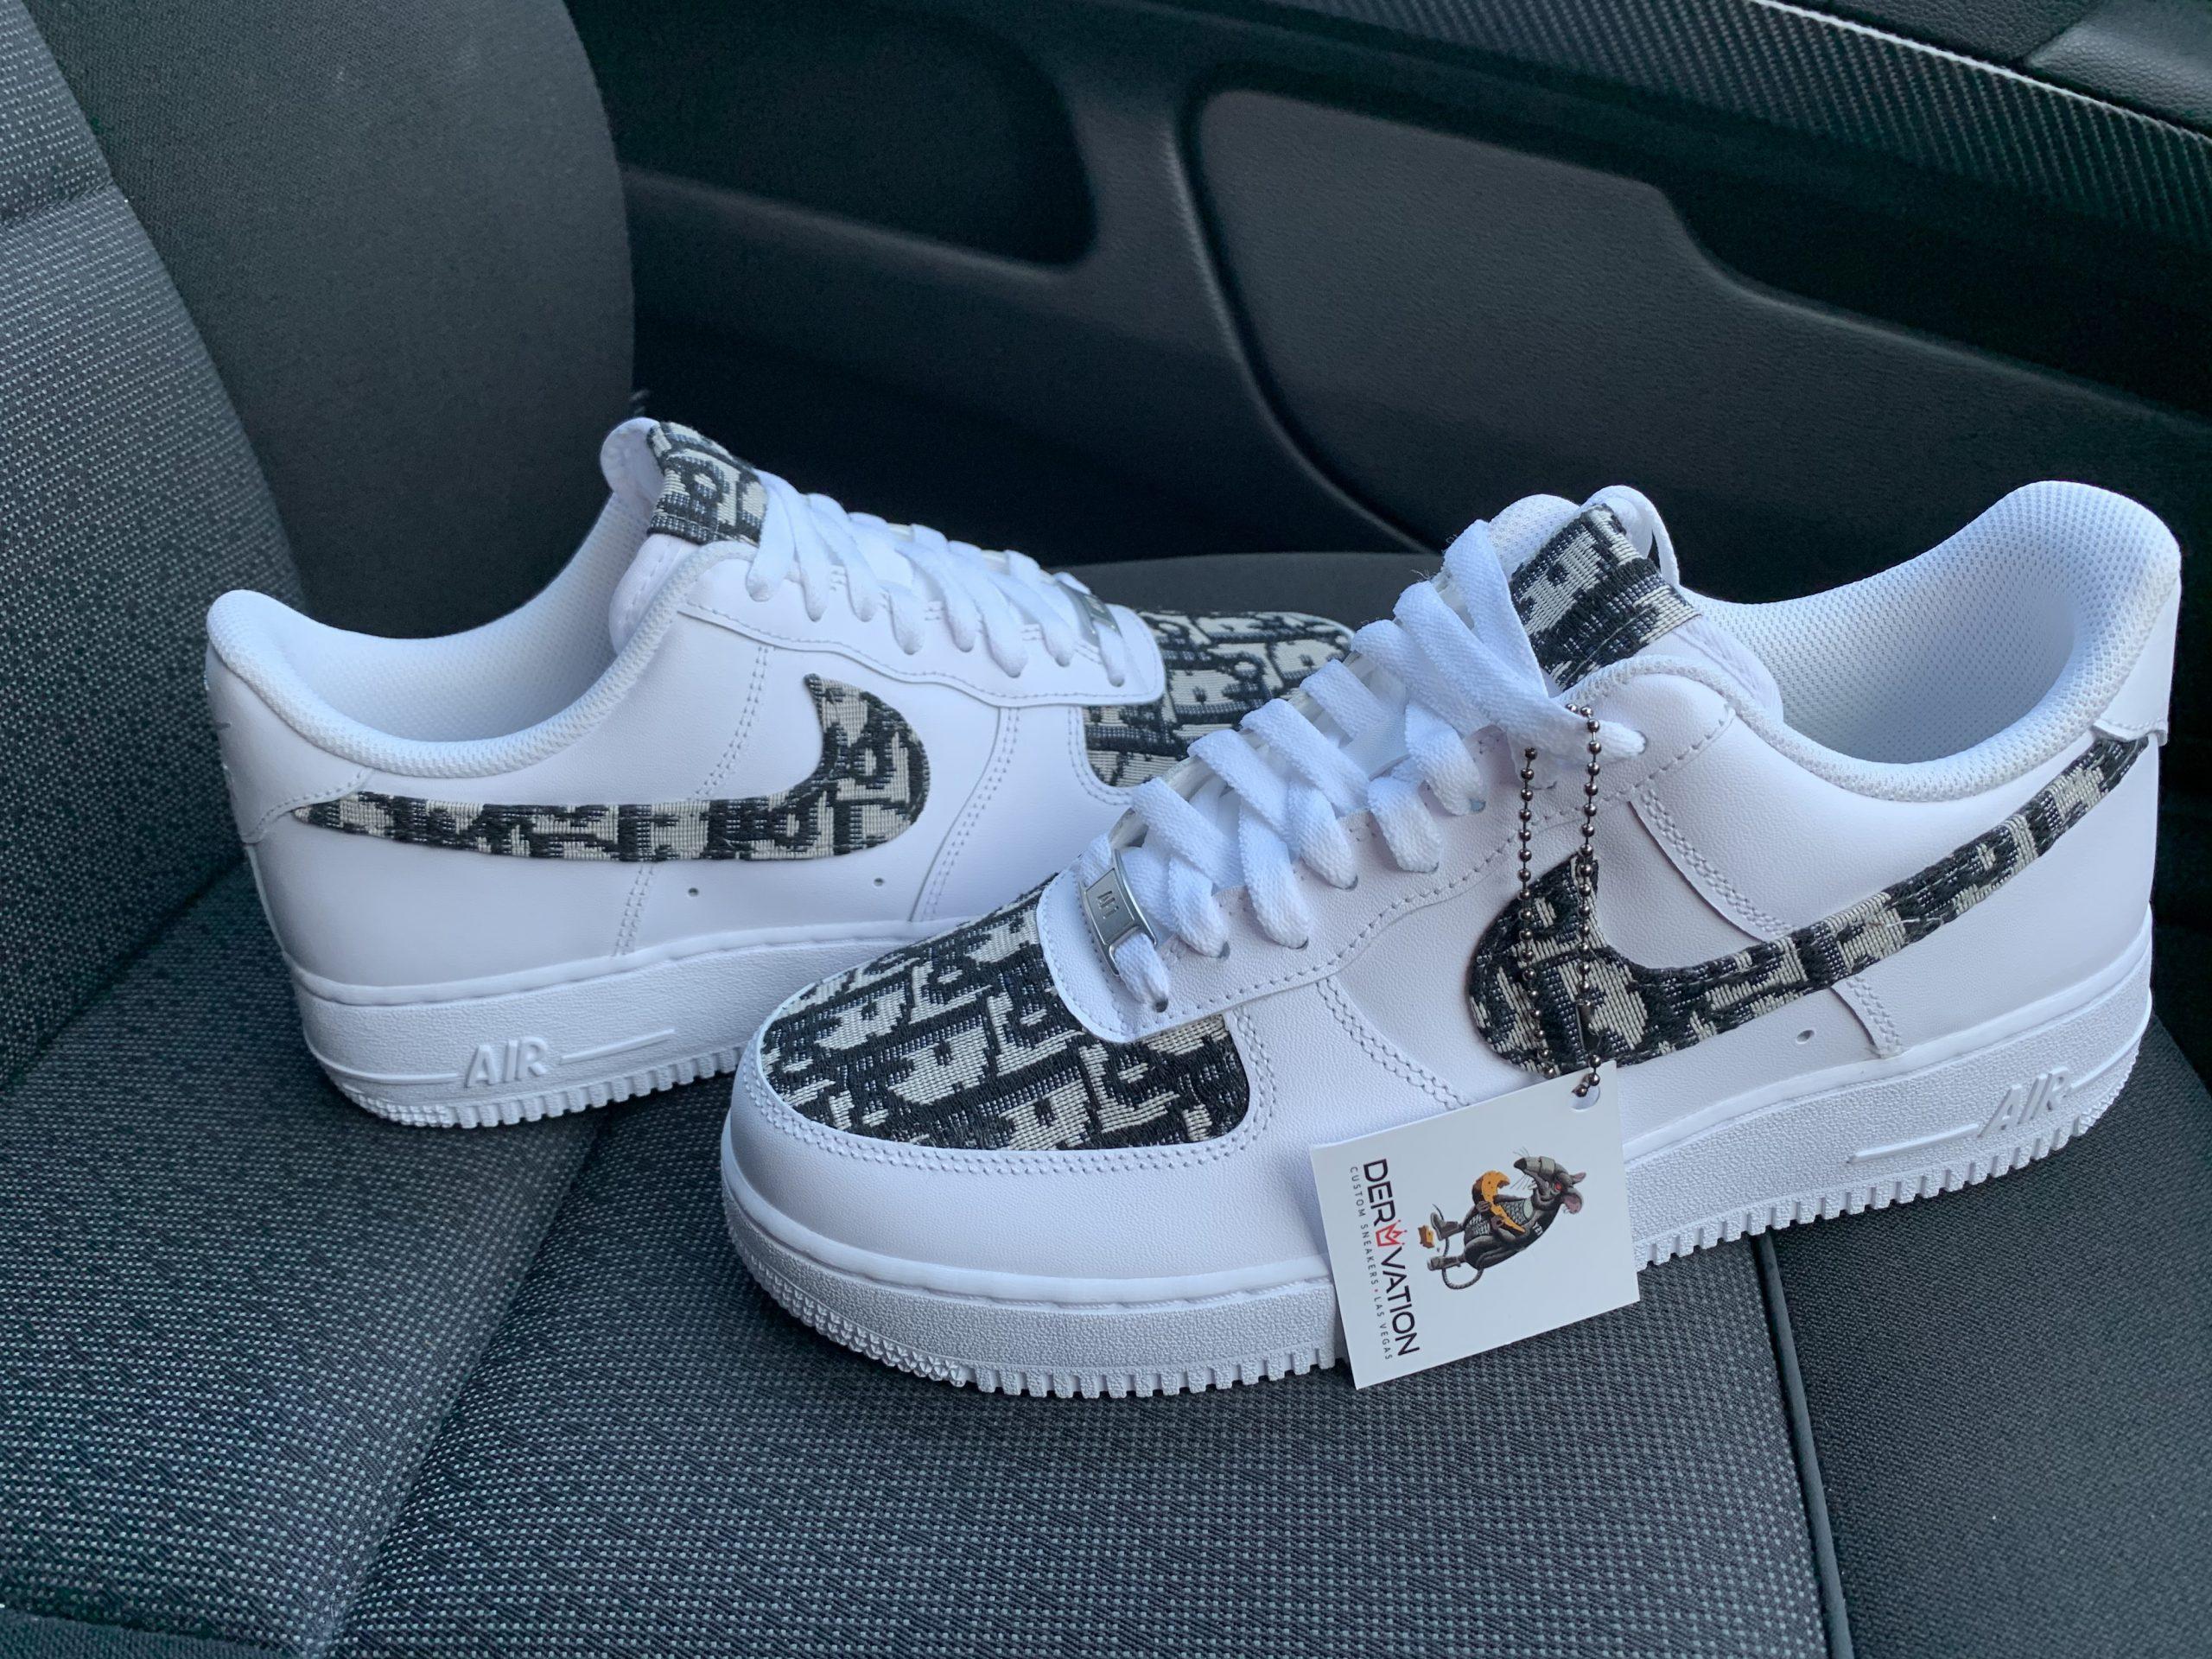 custom air force 1